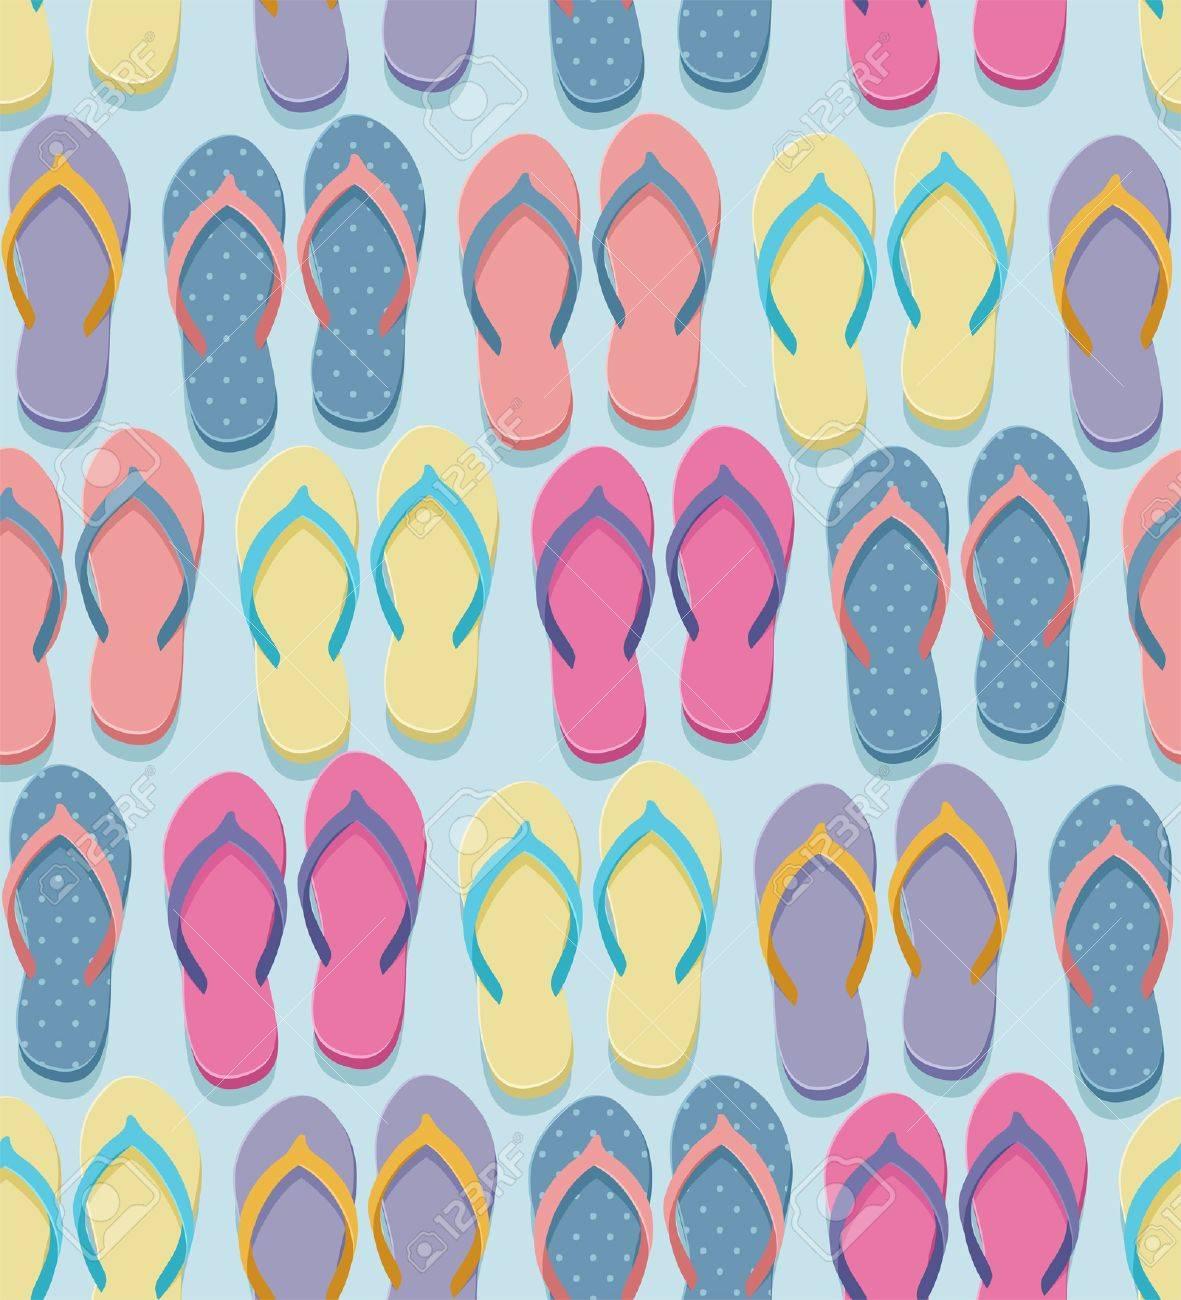 dd77f3bb2912e Seamless pastel colorful flip flops pairs pattern, illustration..